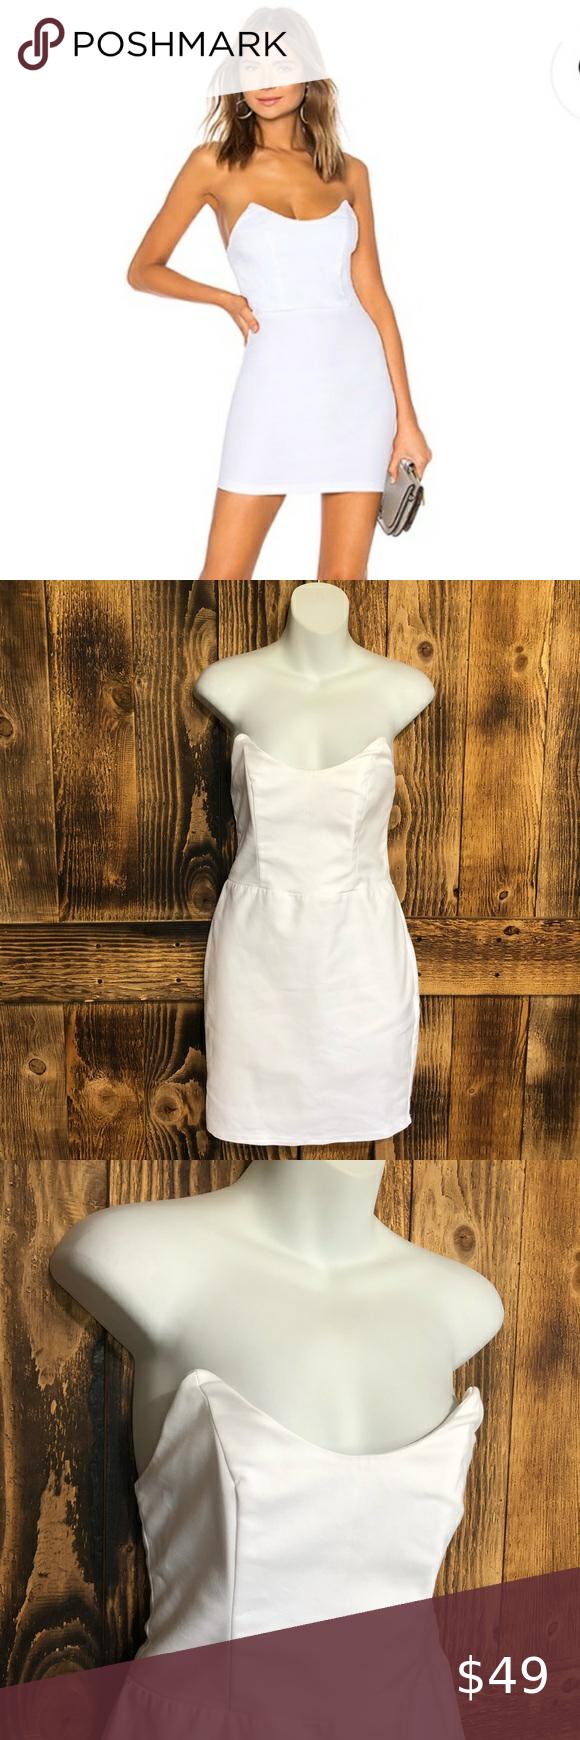 Superdown Strapless Mini Dress White Sz Small White Form Fitting Strapless Mini Dress Superdown Siz Strapless Mini Dress White Mini Dress White Dress [ 1740 x 580 Pixel ]